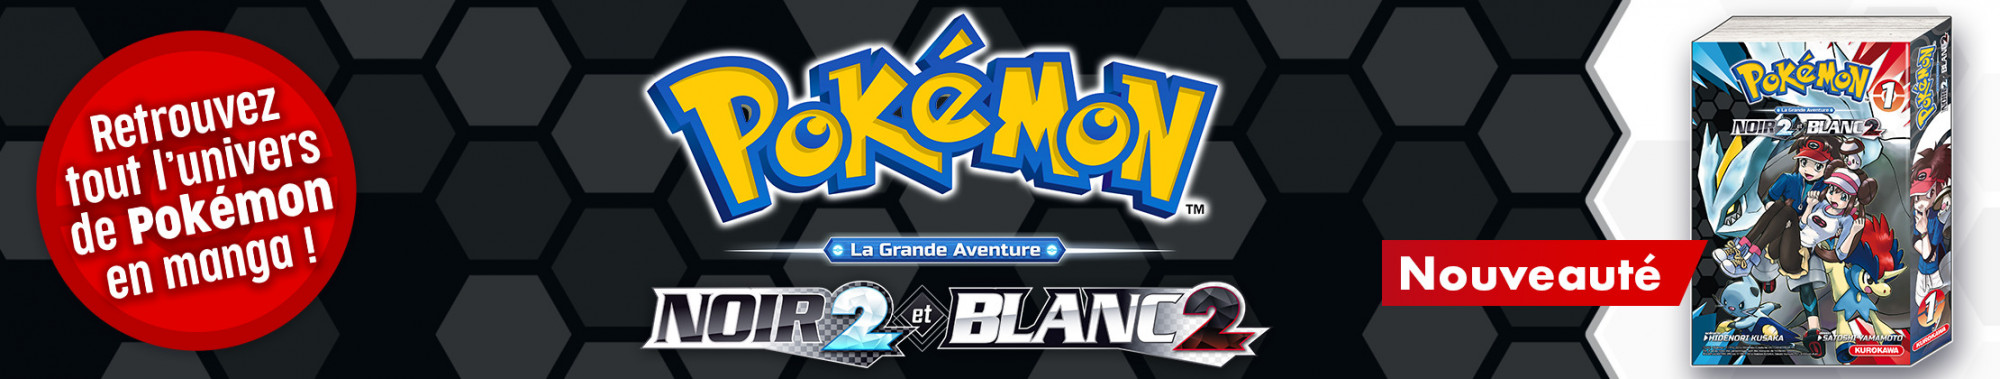 Bannière - KUROKAWA - Pokémon Noir 2 et Blanc 2 - T1